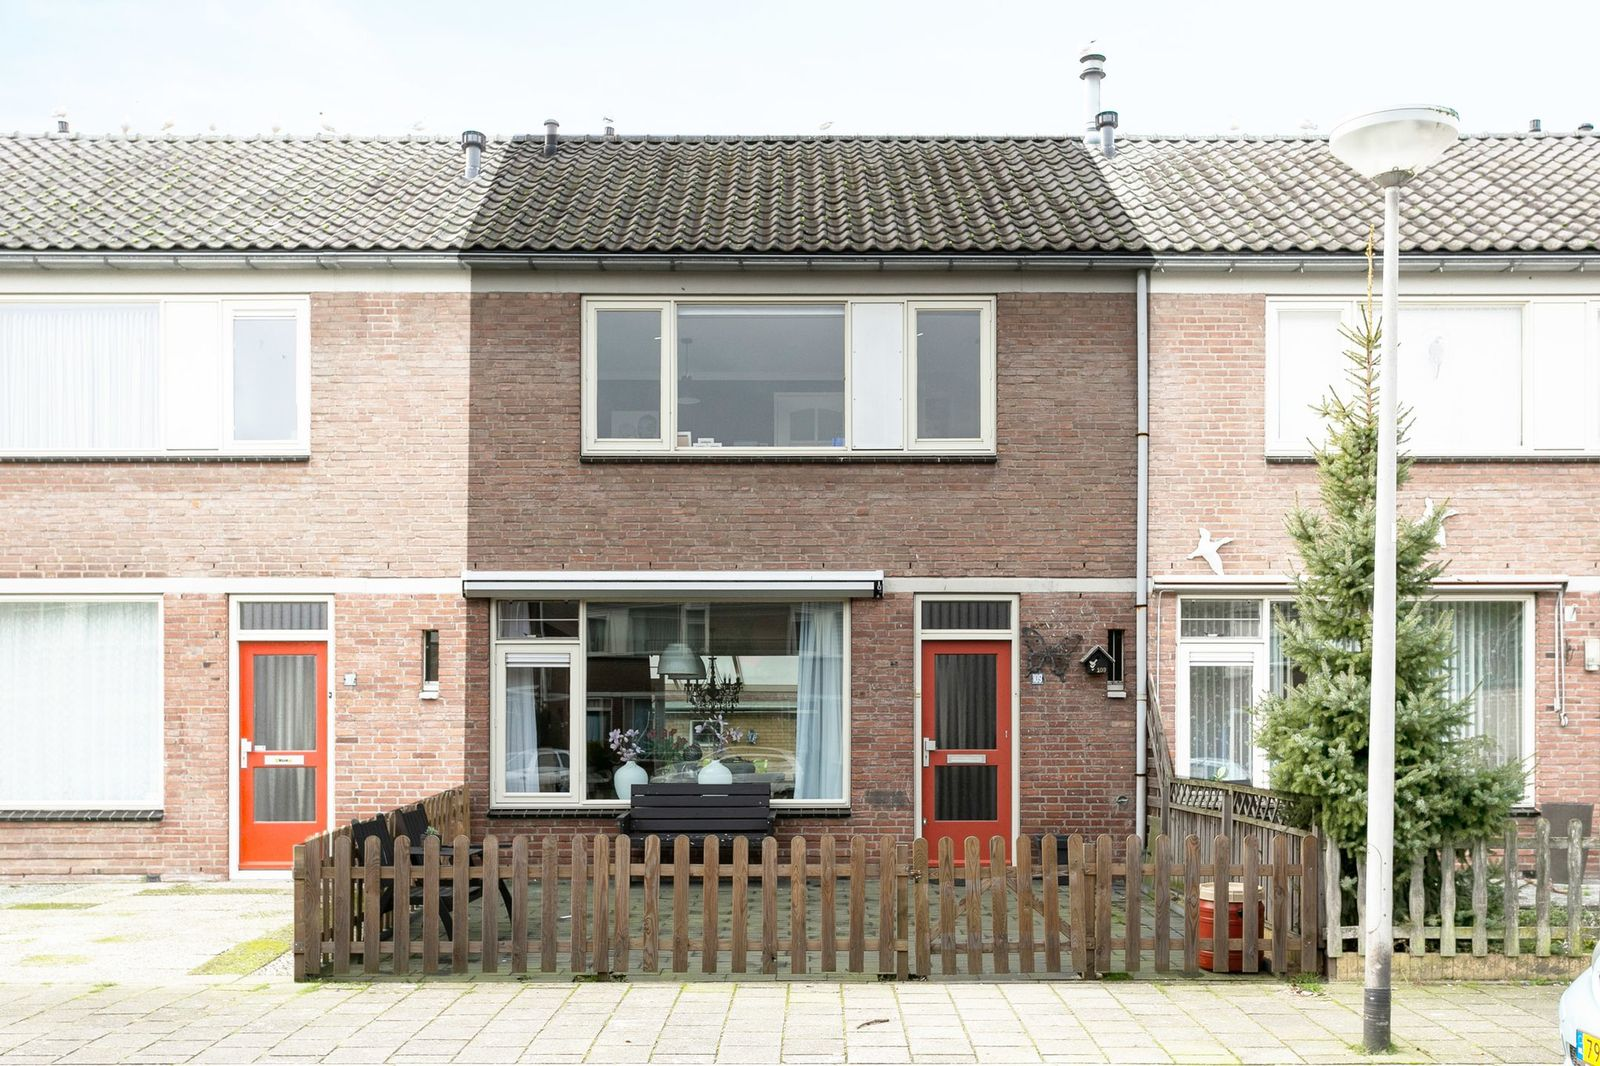 Paukenstraat 109, Nijmegen